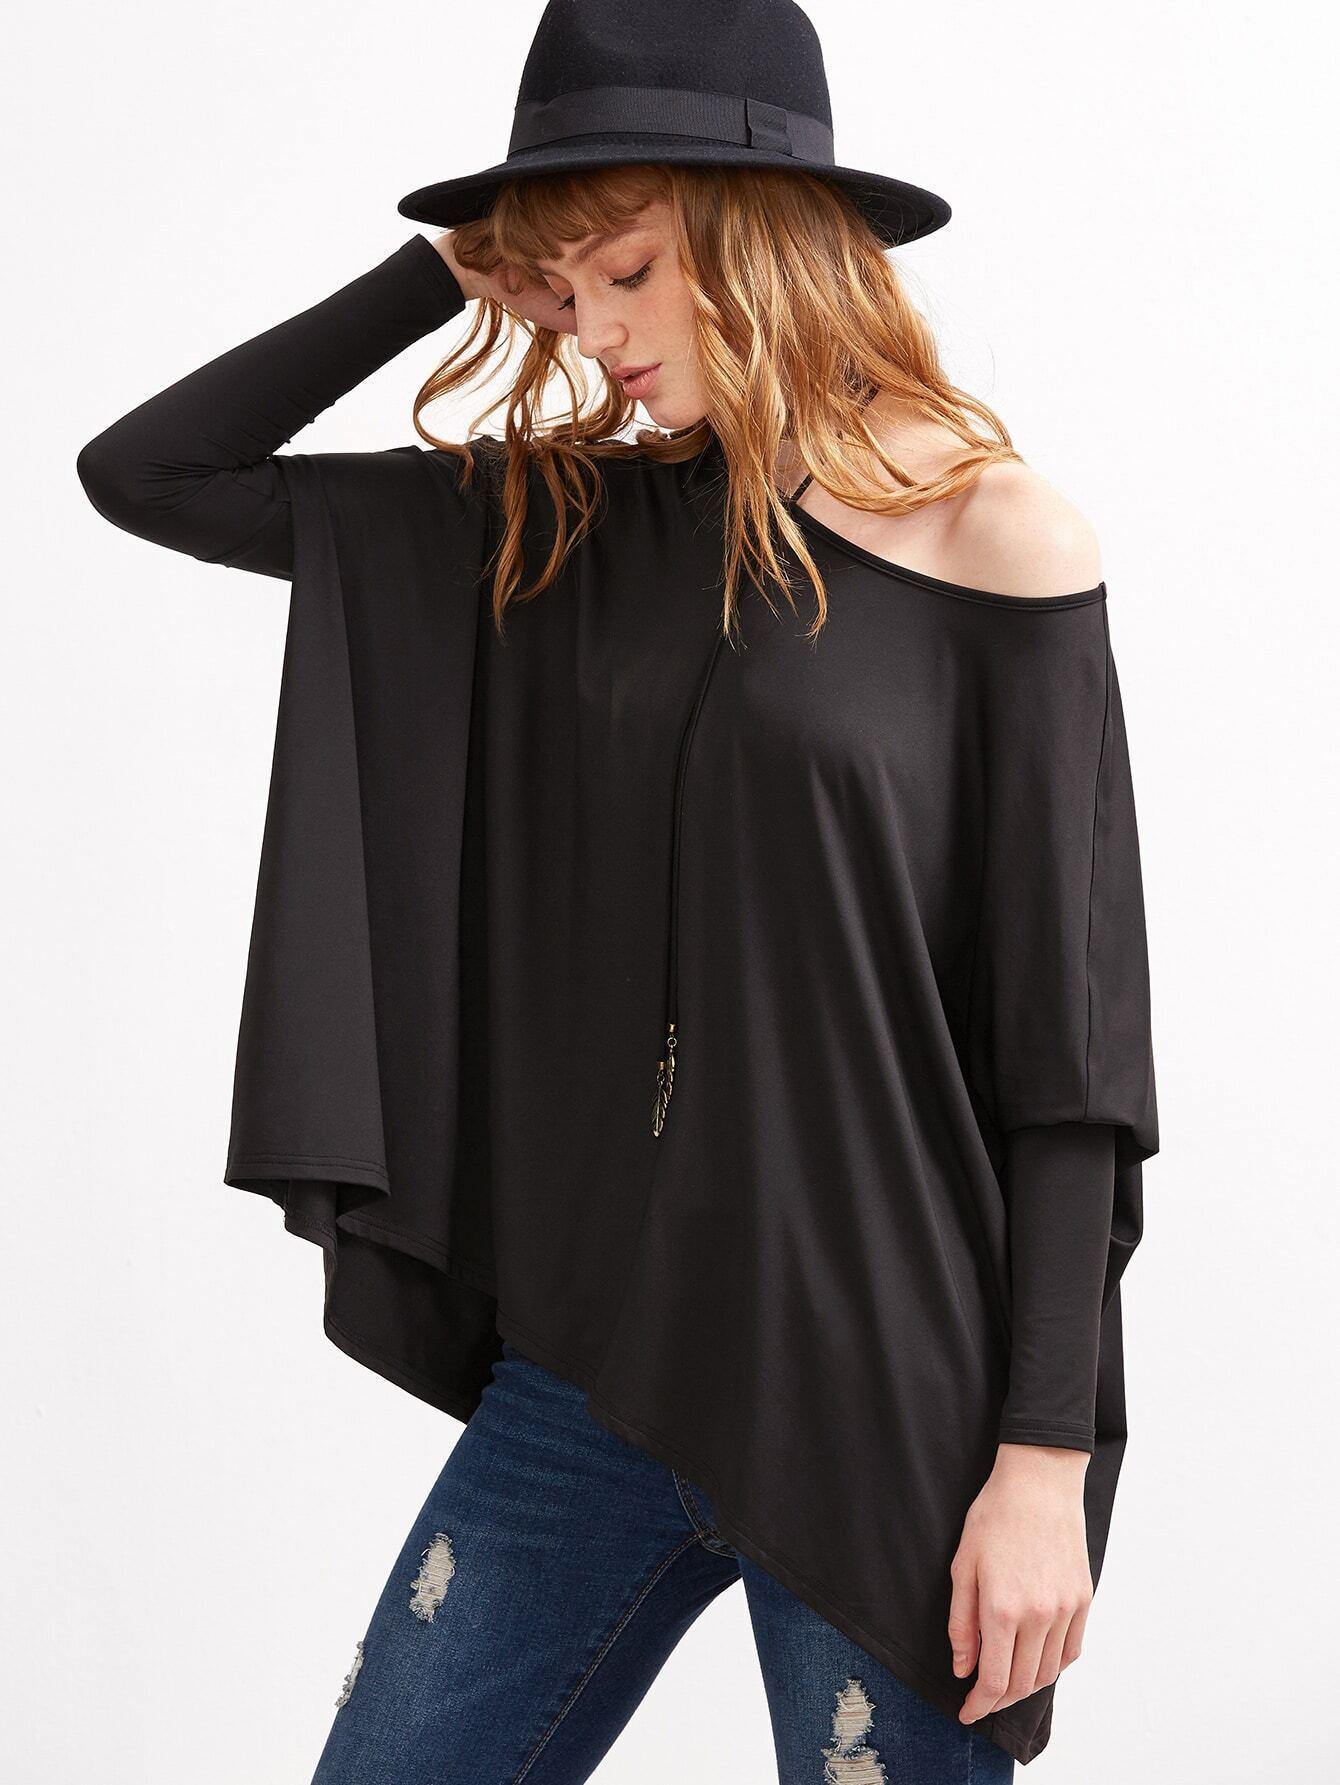 Oversized black t shirt - Black Boat Neck Oversized Dolman Sleeve T Shirt Pictures